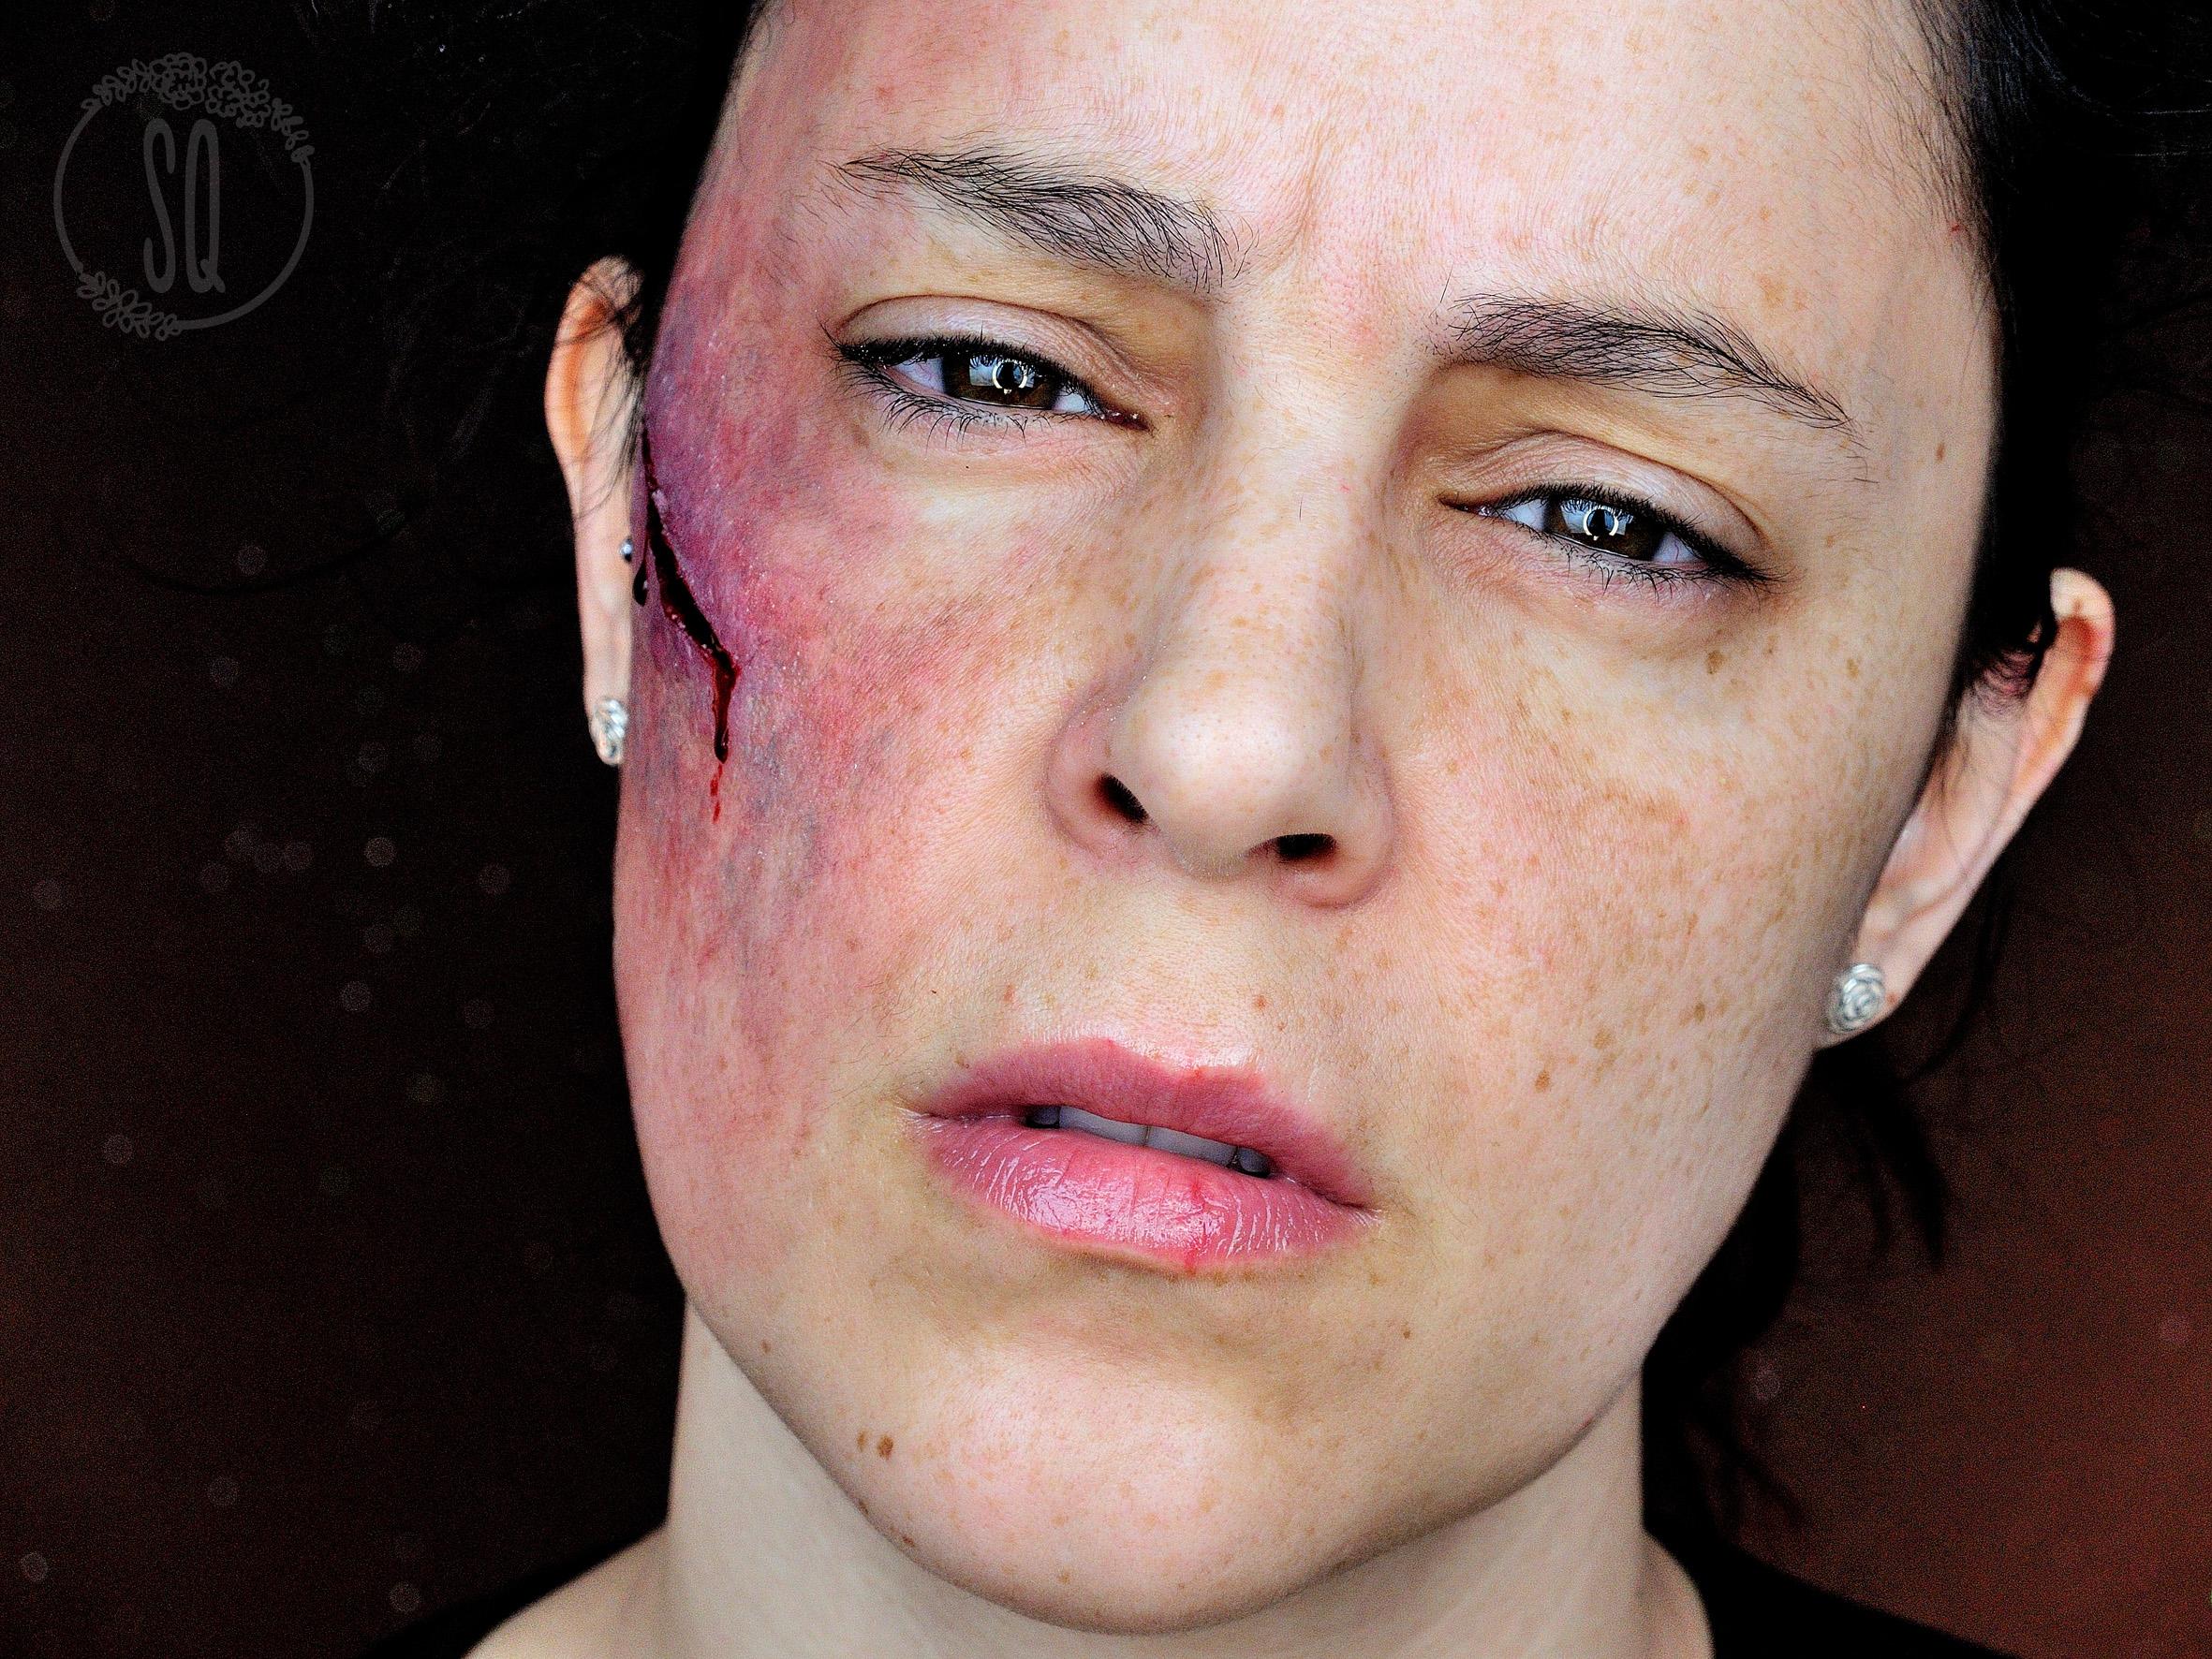 Bruise makeup tutorial emo makeup cut with bruise makeup tutorial effect cut with bruise makeup tutorial effect baditri Choice Image